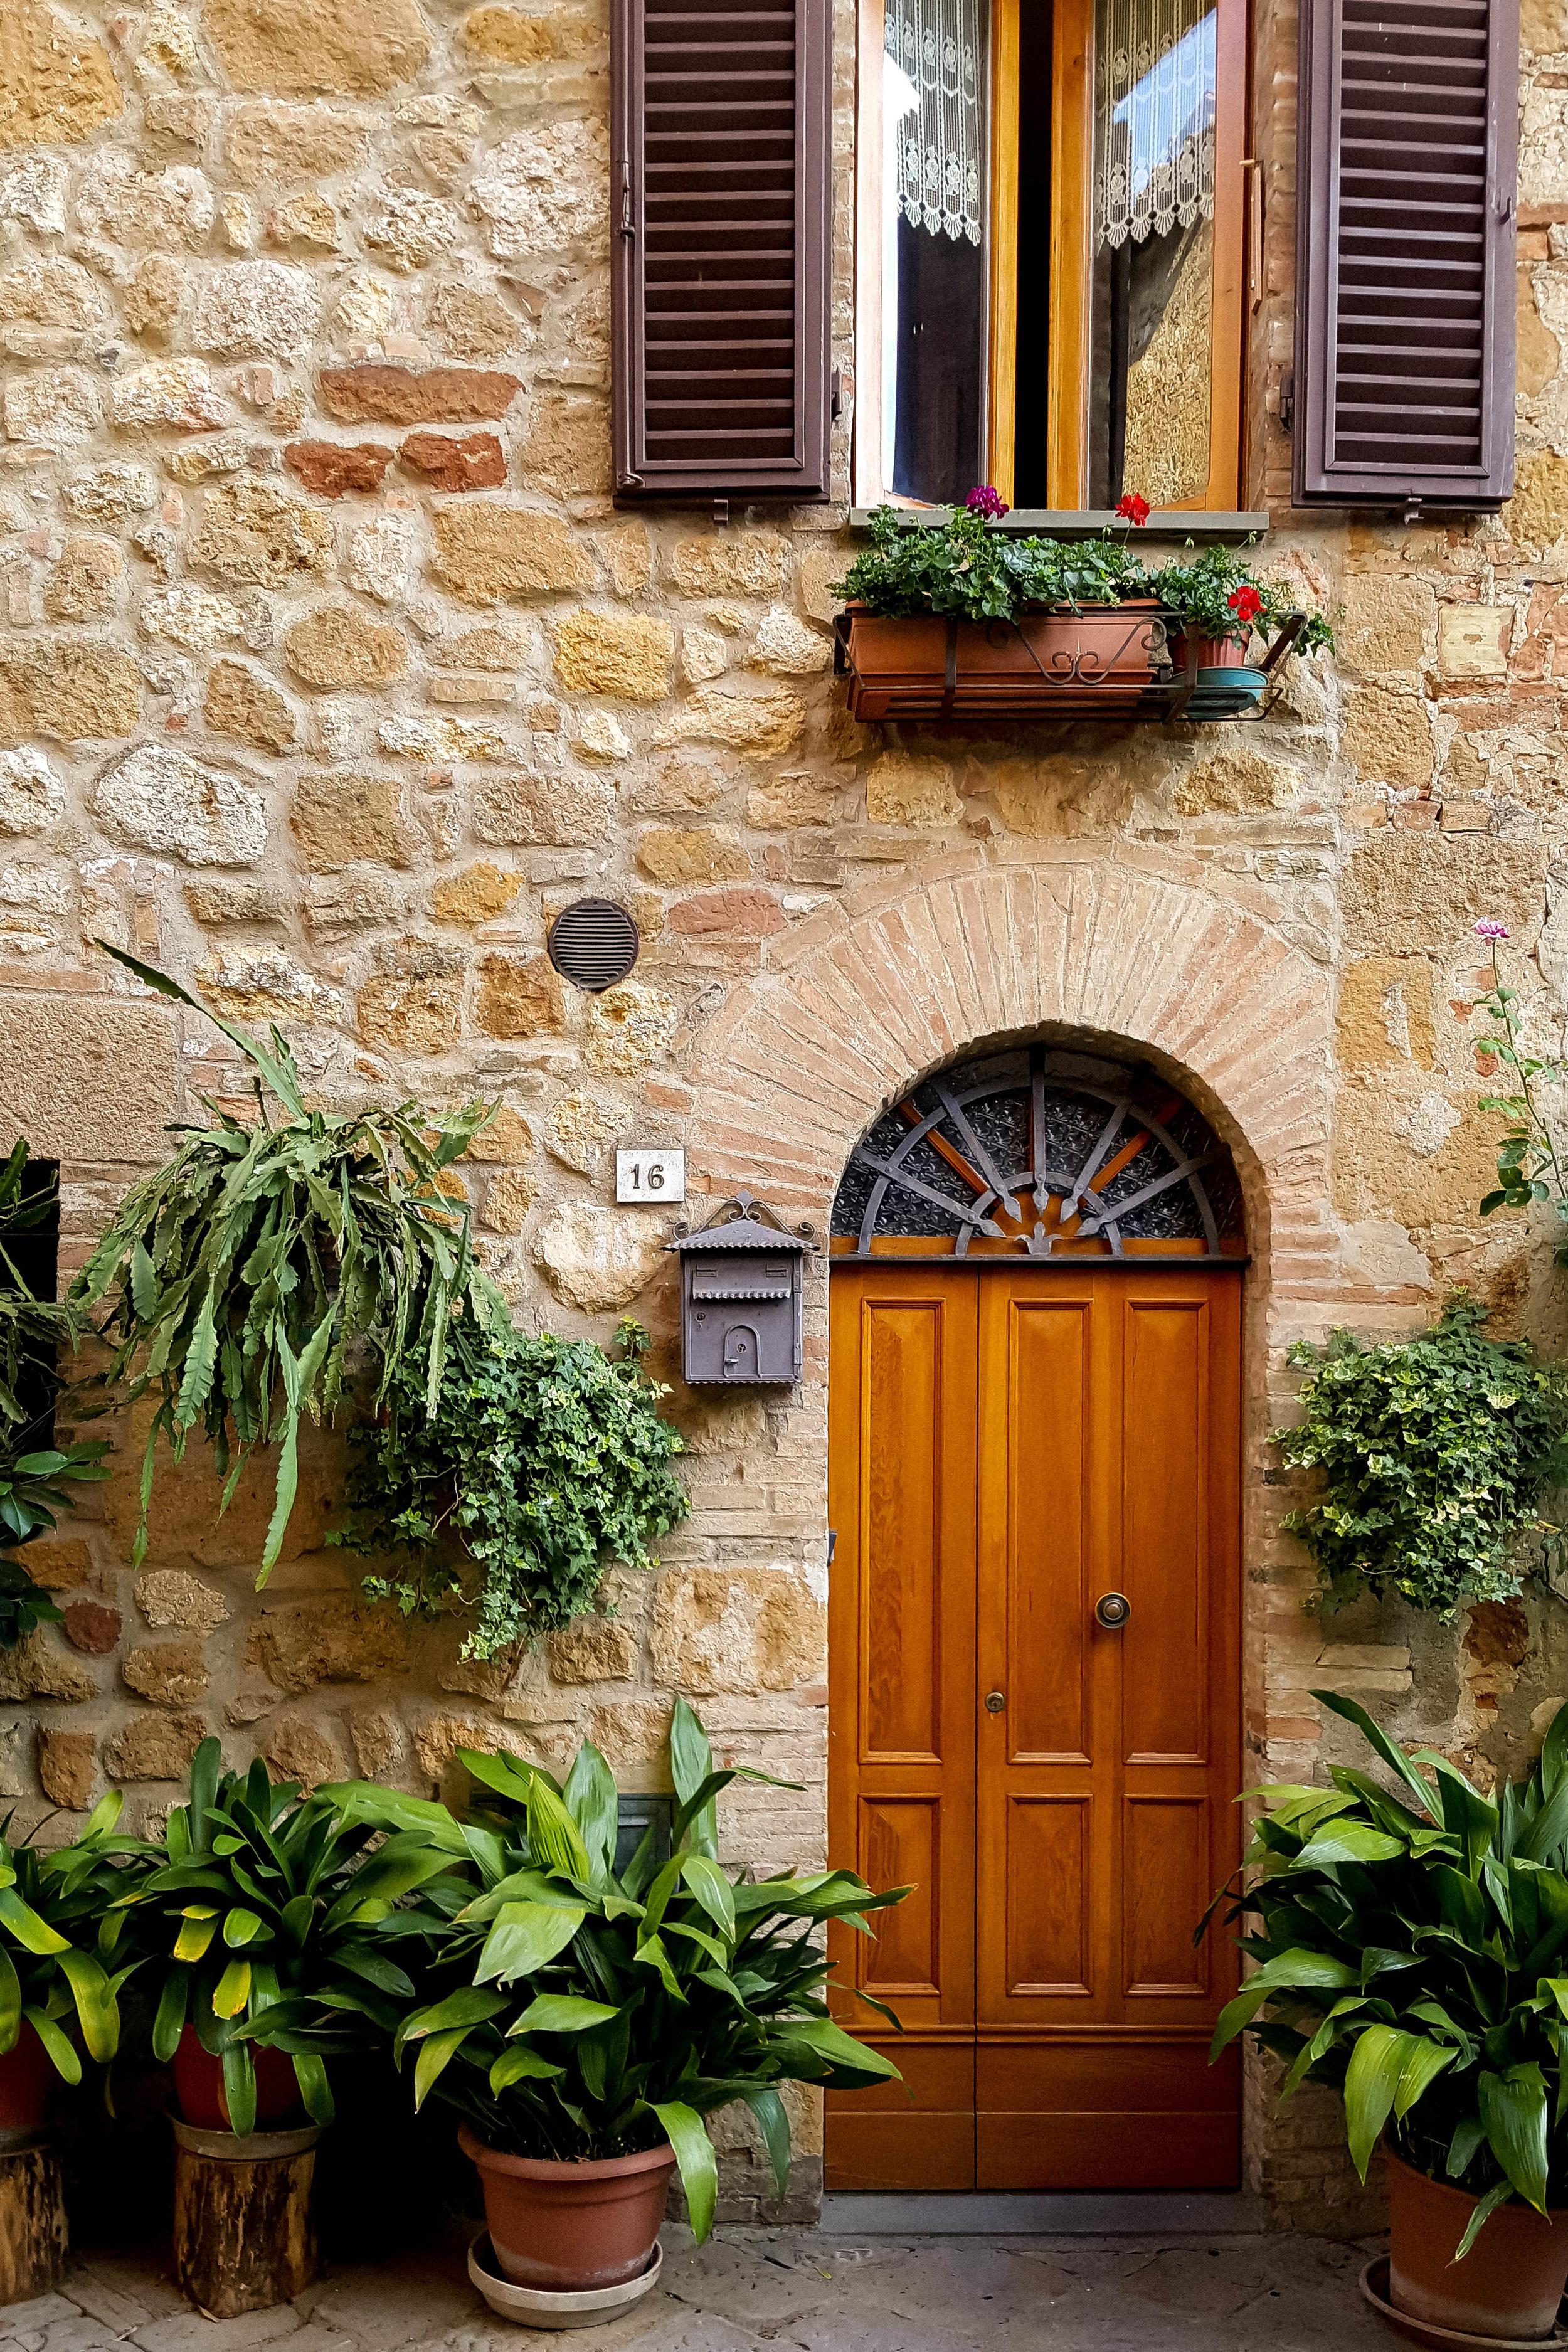 Doors of Pienza, Tuscany